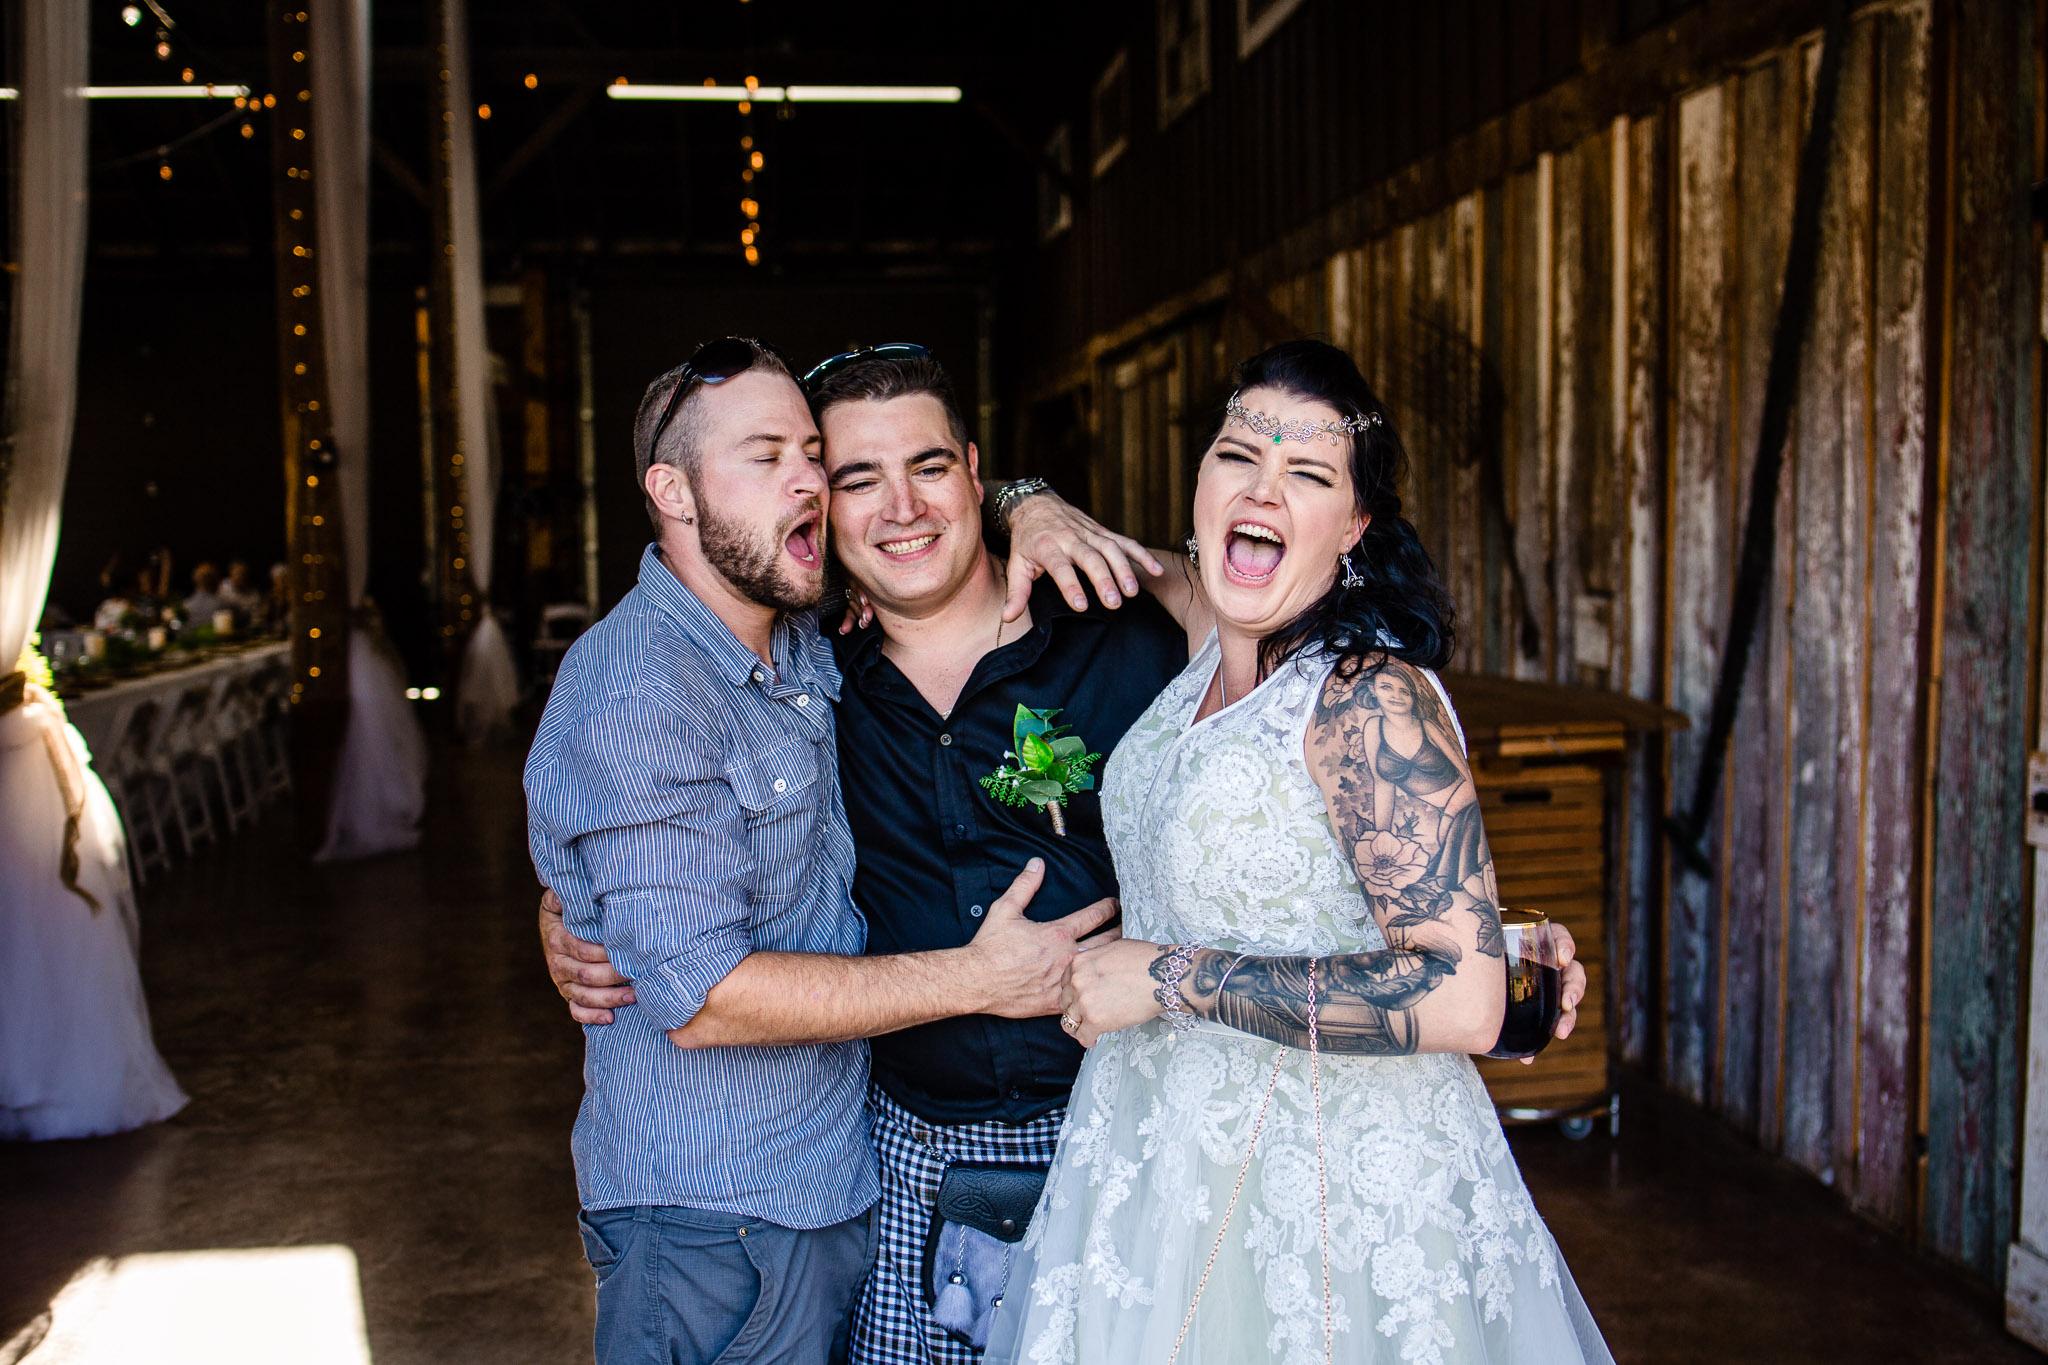 White-Owl-Barn-Langley-Wedding-Photographer-Rustic-Scottish-Country-Food-Truck-Documentary-Open-Bar-Wedding-867.jpg